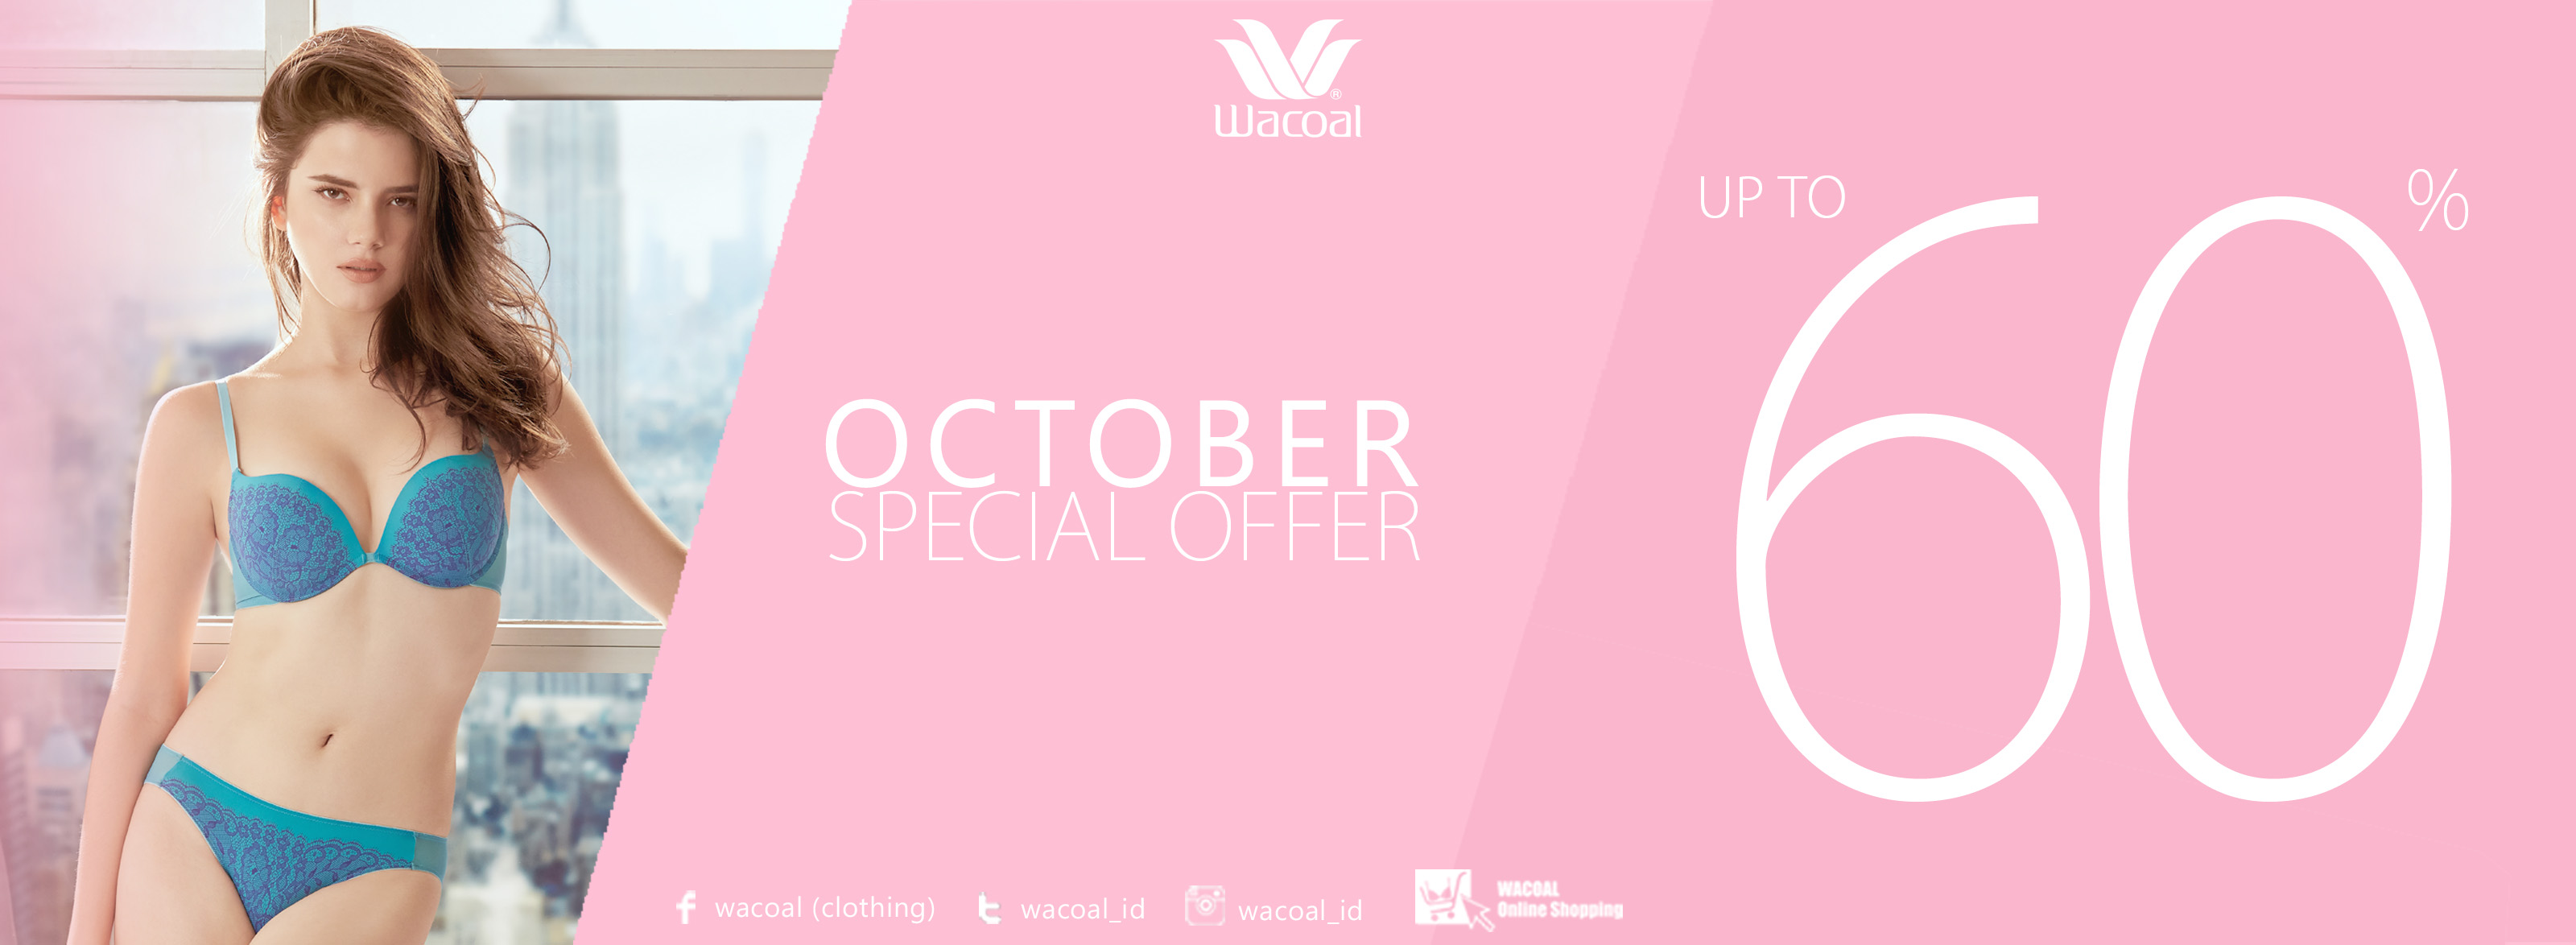 Wacoal octber special offer